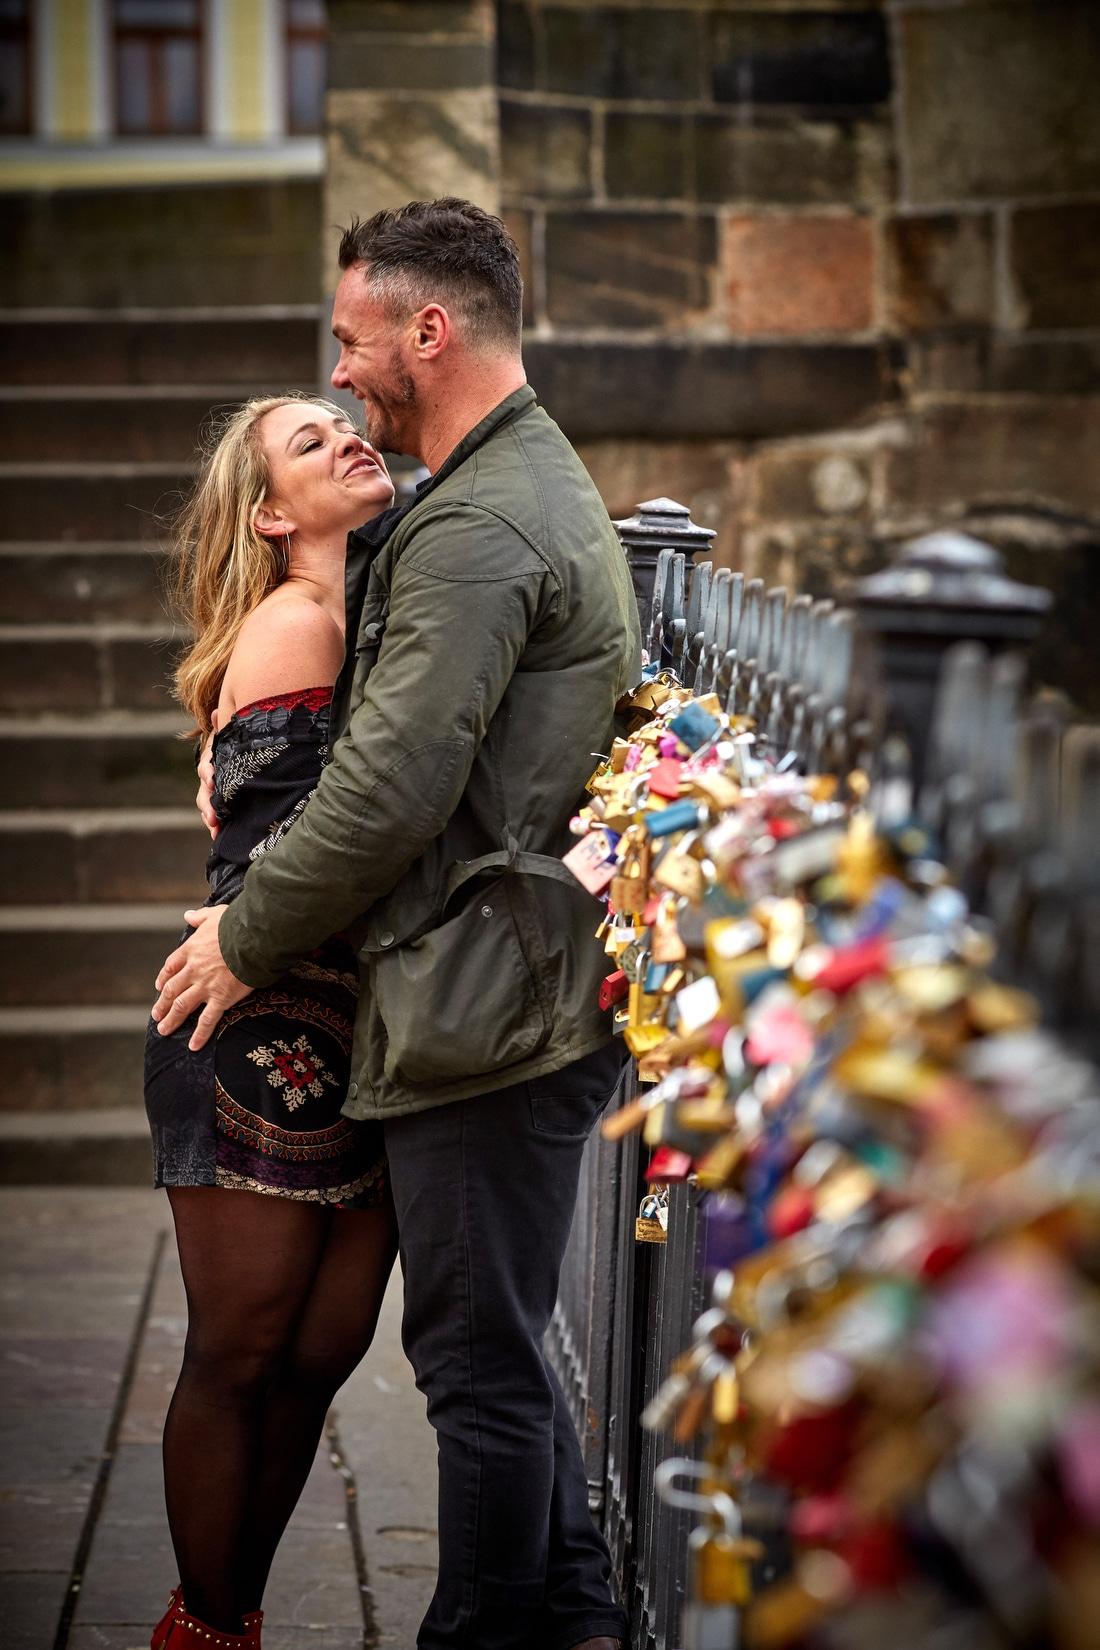 Lovers at the love locks near the Charles Bridge